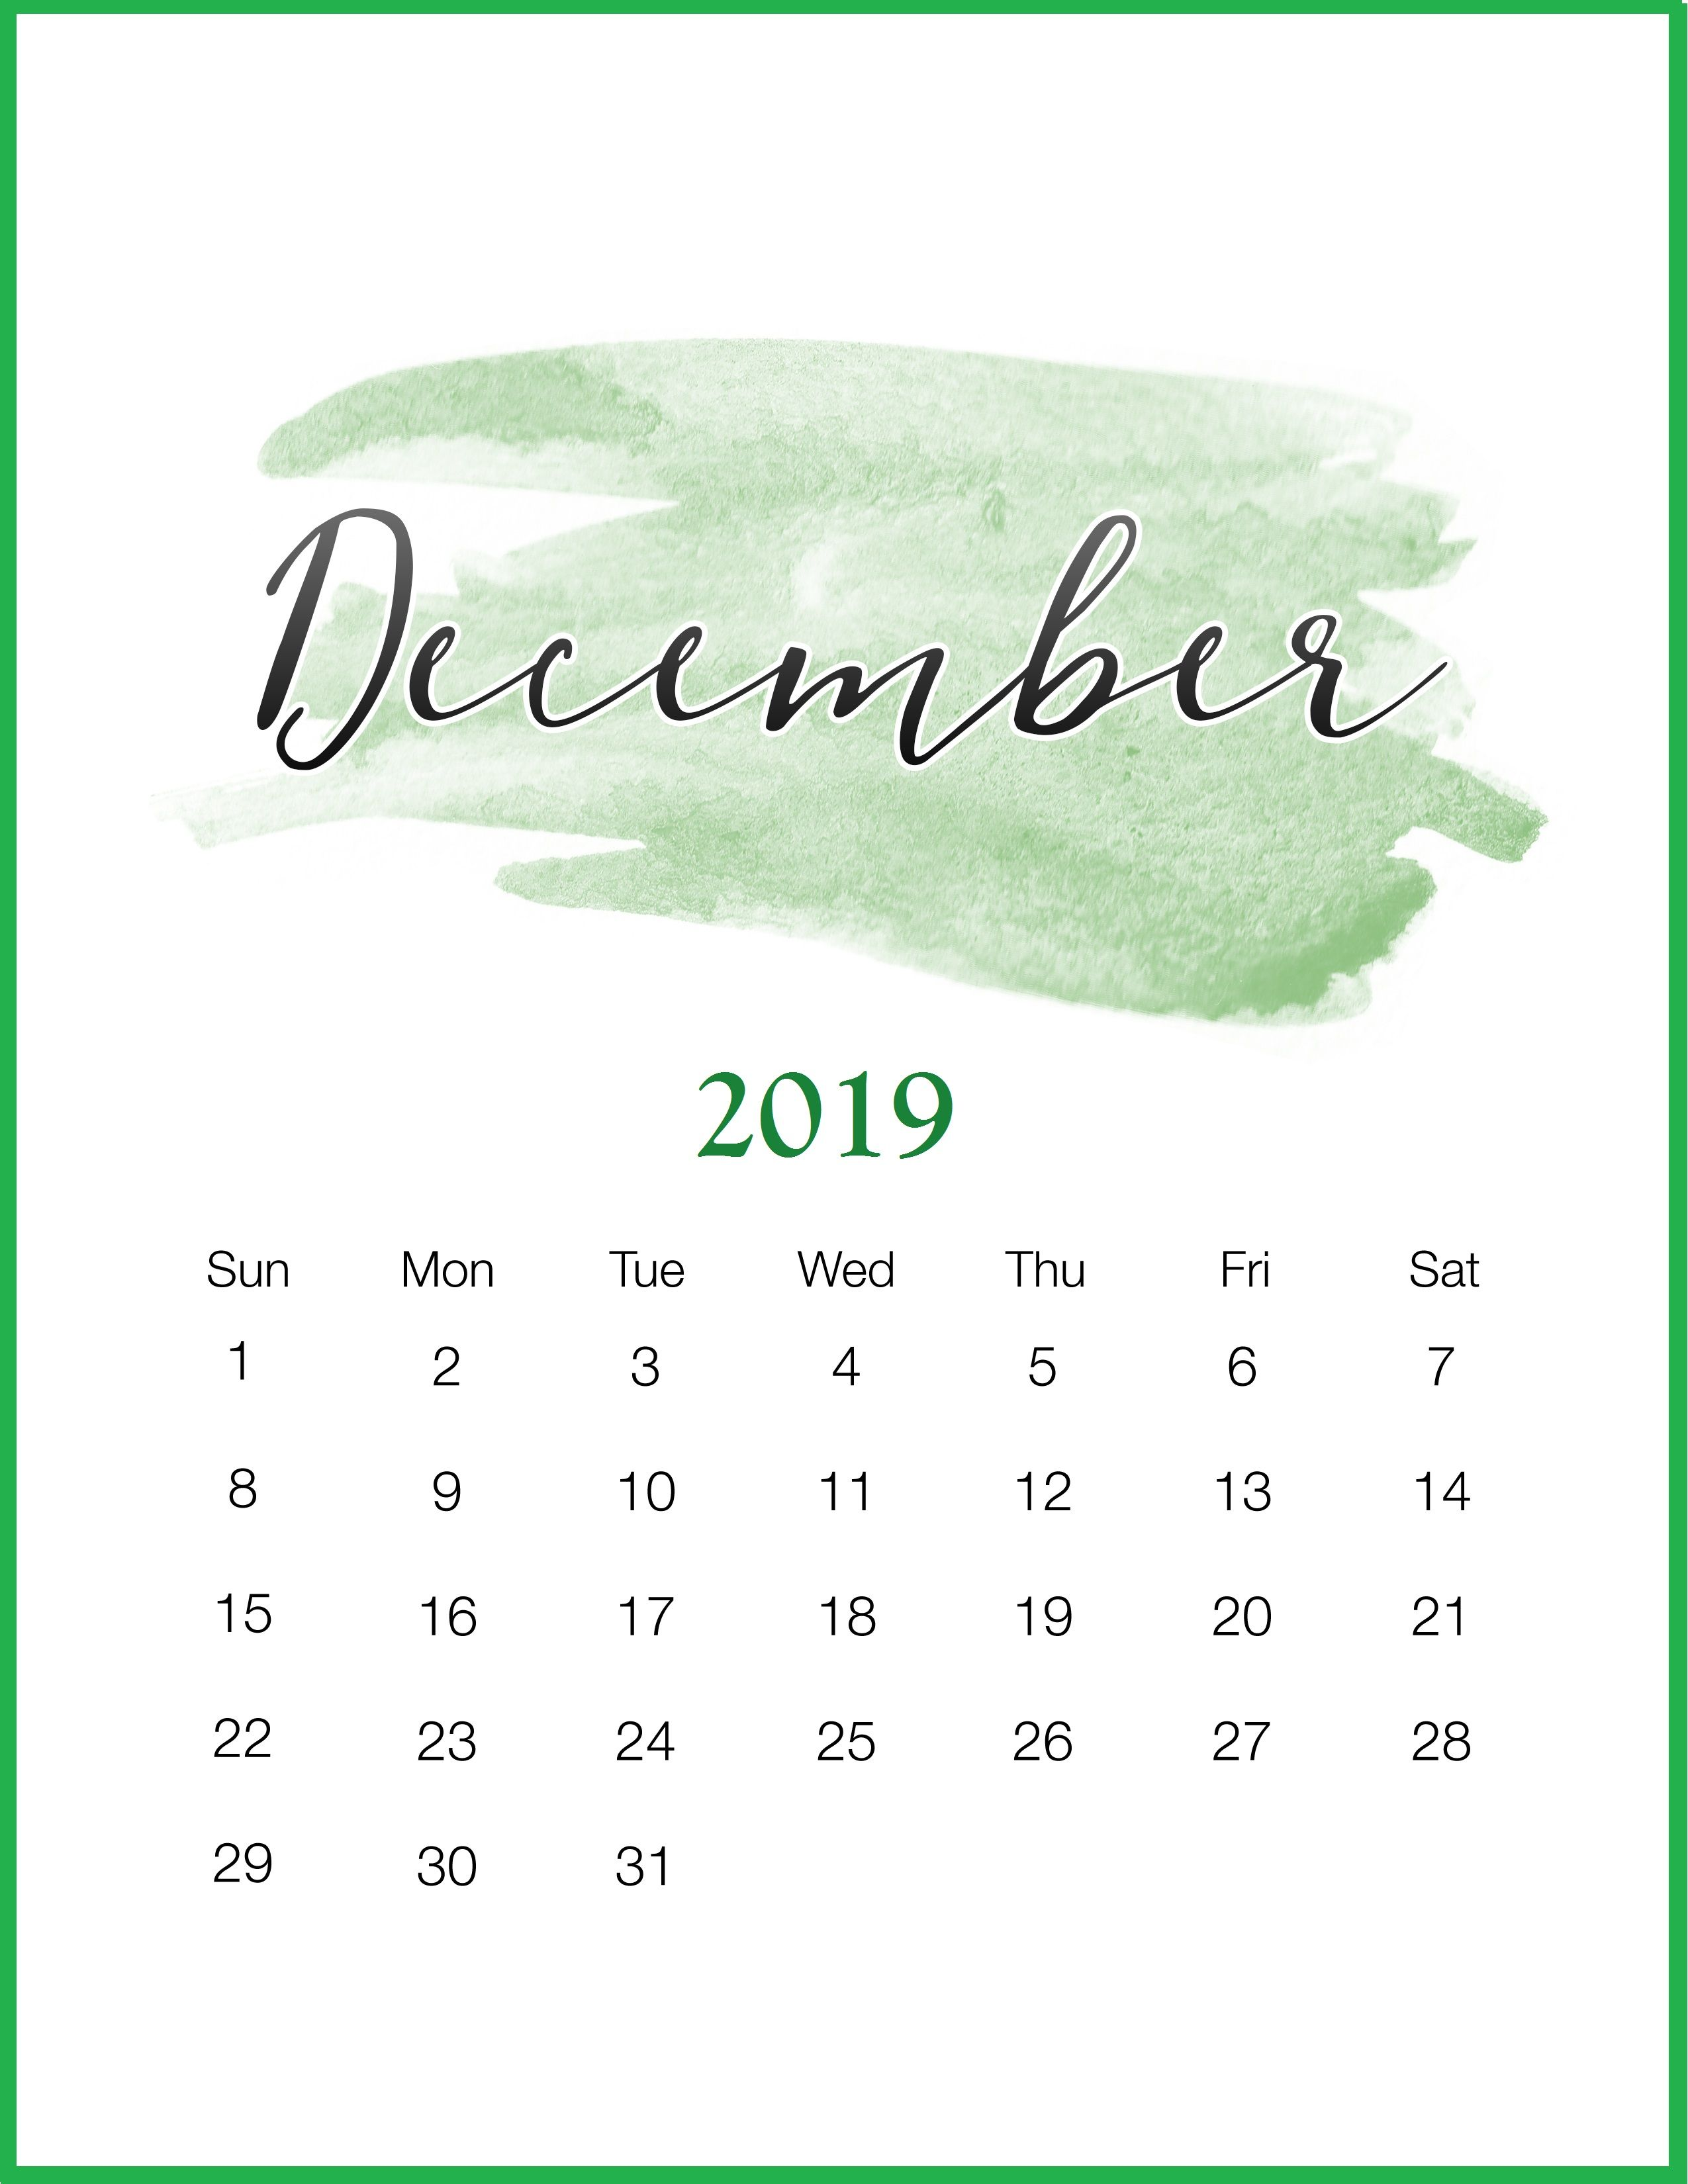 Watercolor 2019 December Printable Calendar Kalendar Pinterest